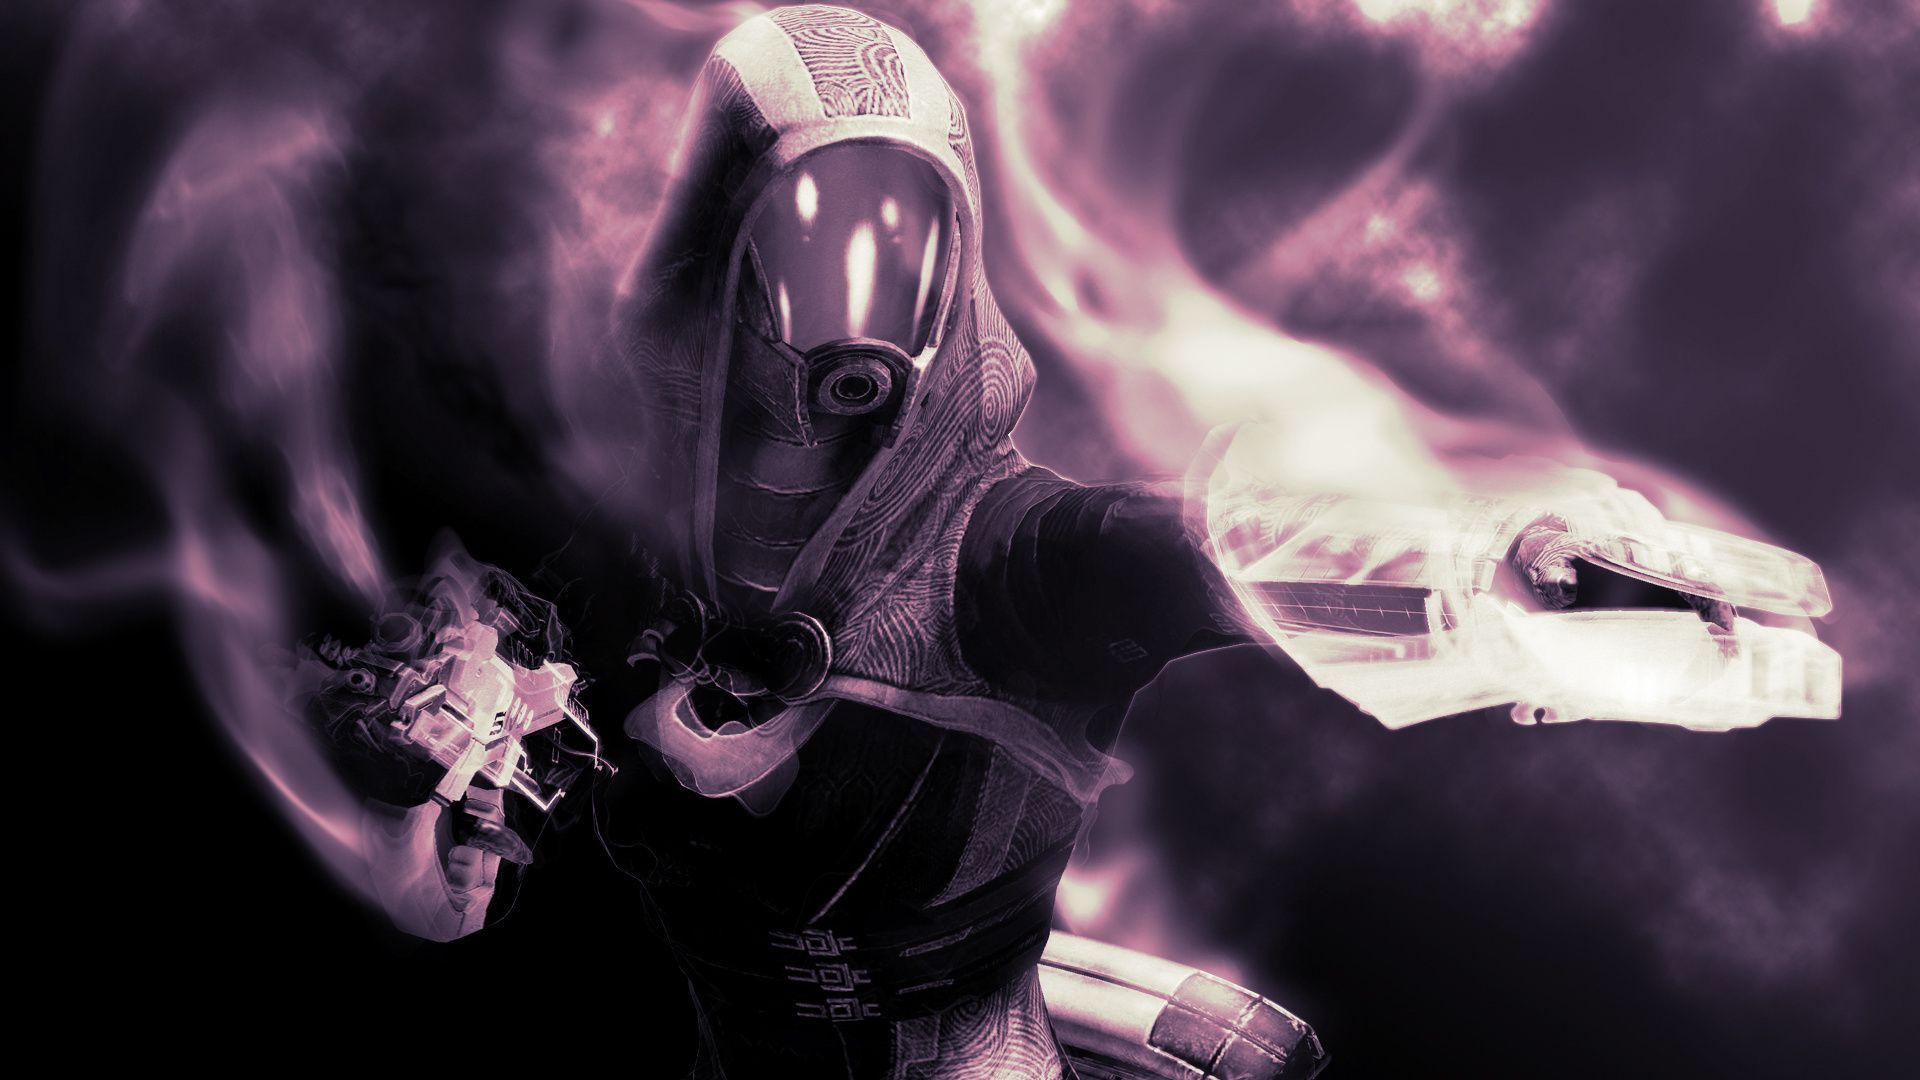 Wallpaper-mass-effect-talizorah-nar-rayya-smoke-gas-mask-.jpg